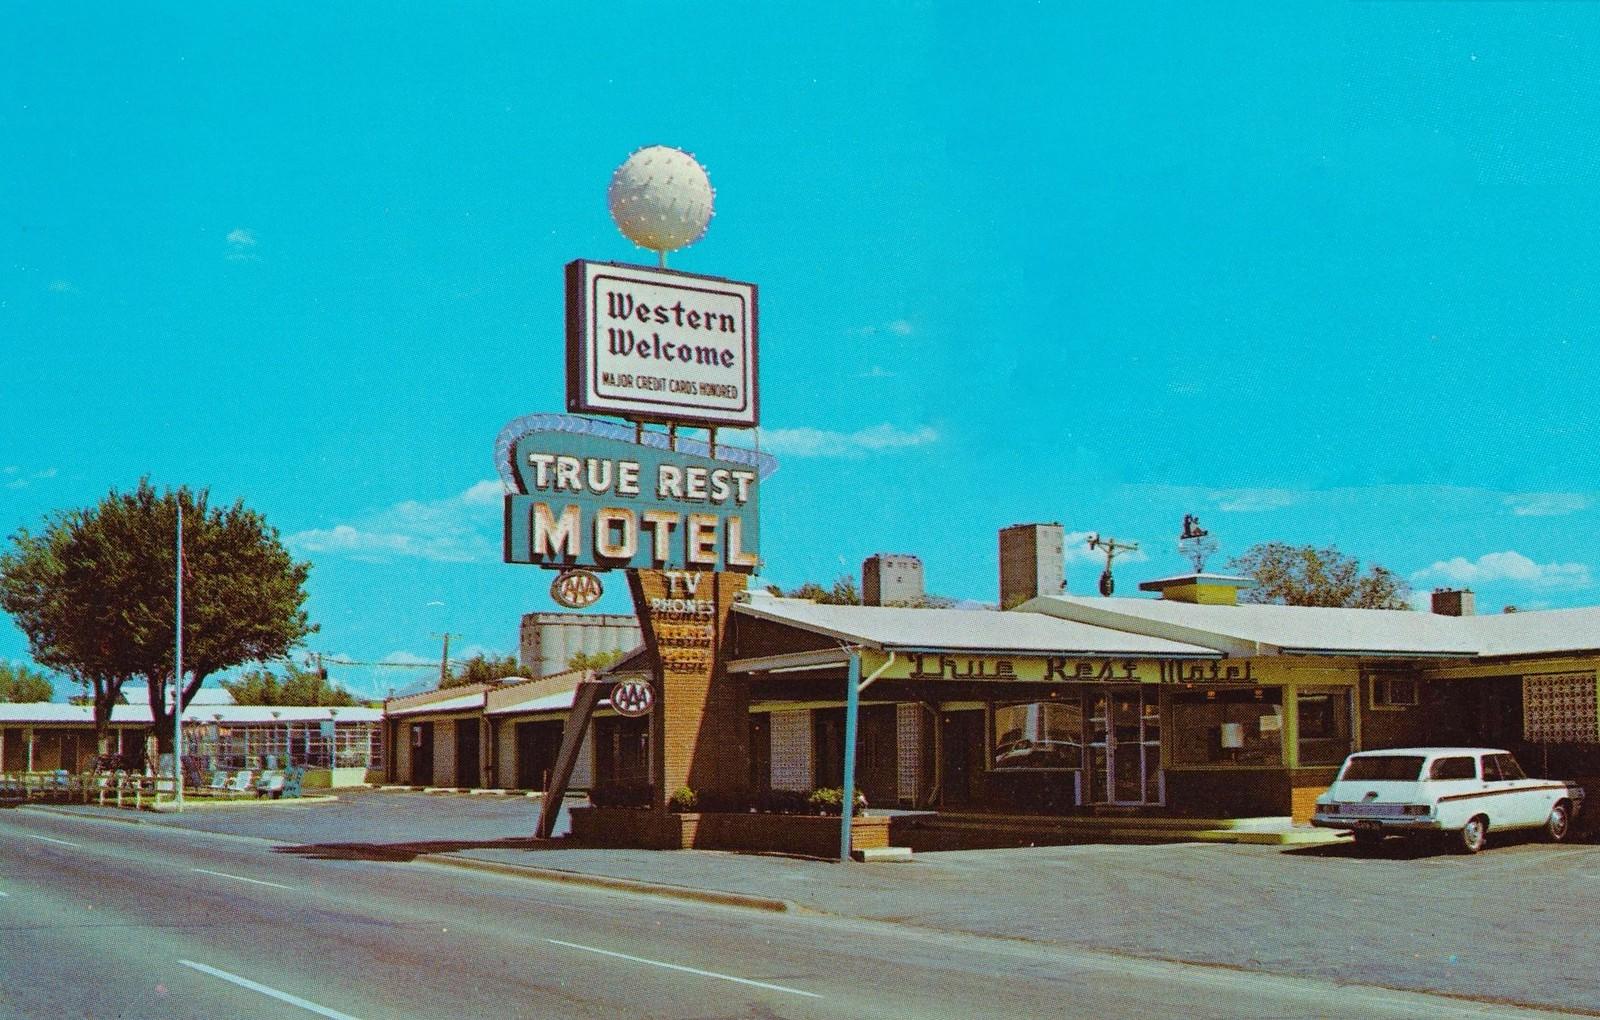 True Rest Motel - 2806 Amarillo Boulevard East, Amarillo, Texas U.S.A. - 1960's